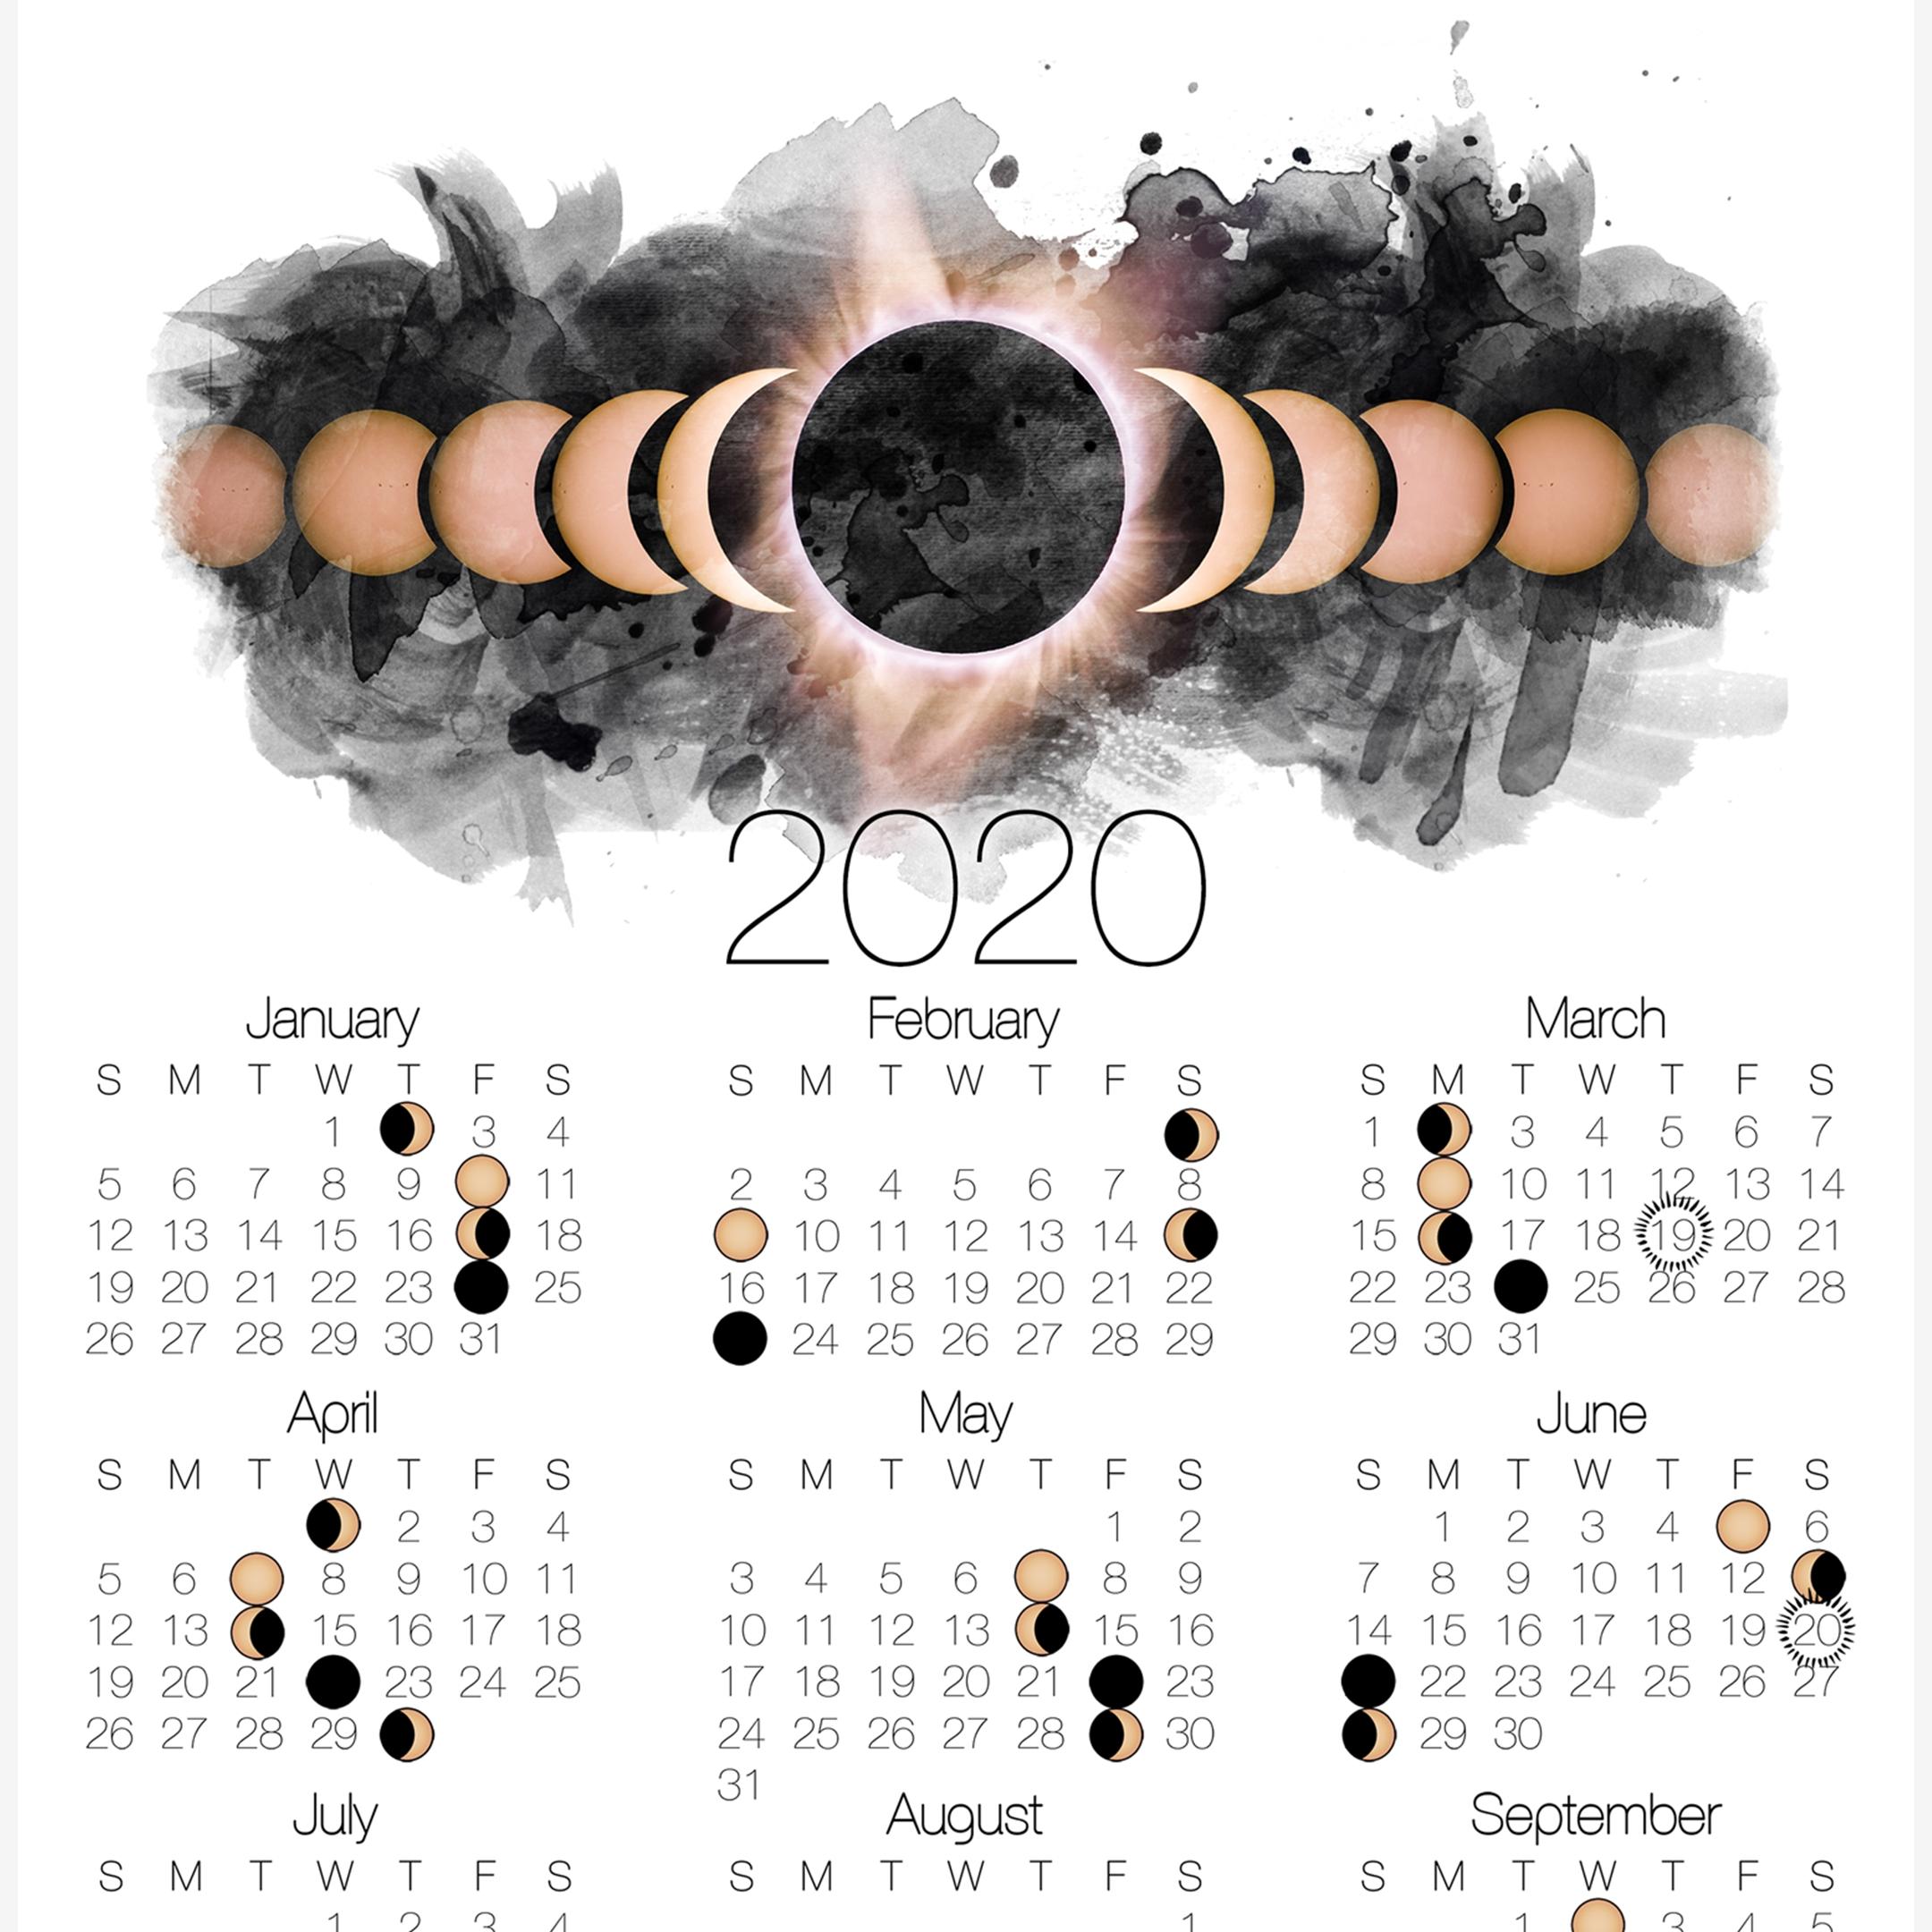 2020 Moon Phase Calendar - Lunar Calendar With Solar Eclipse